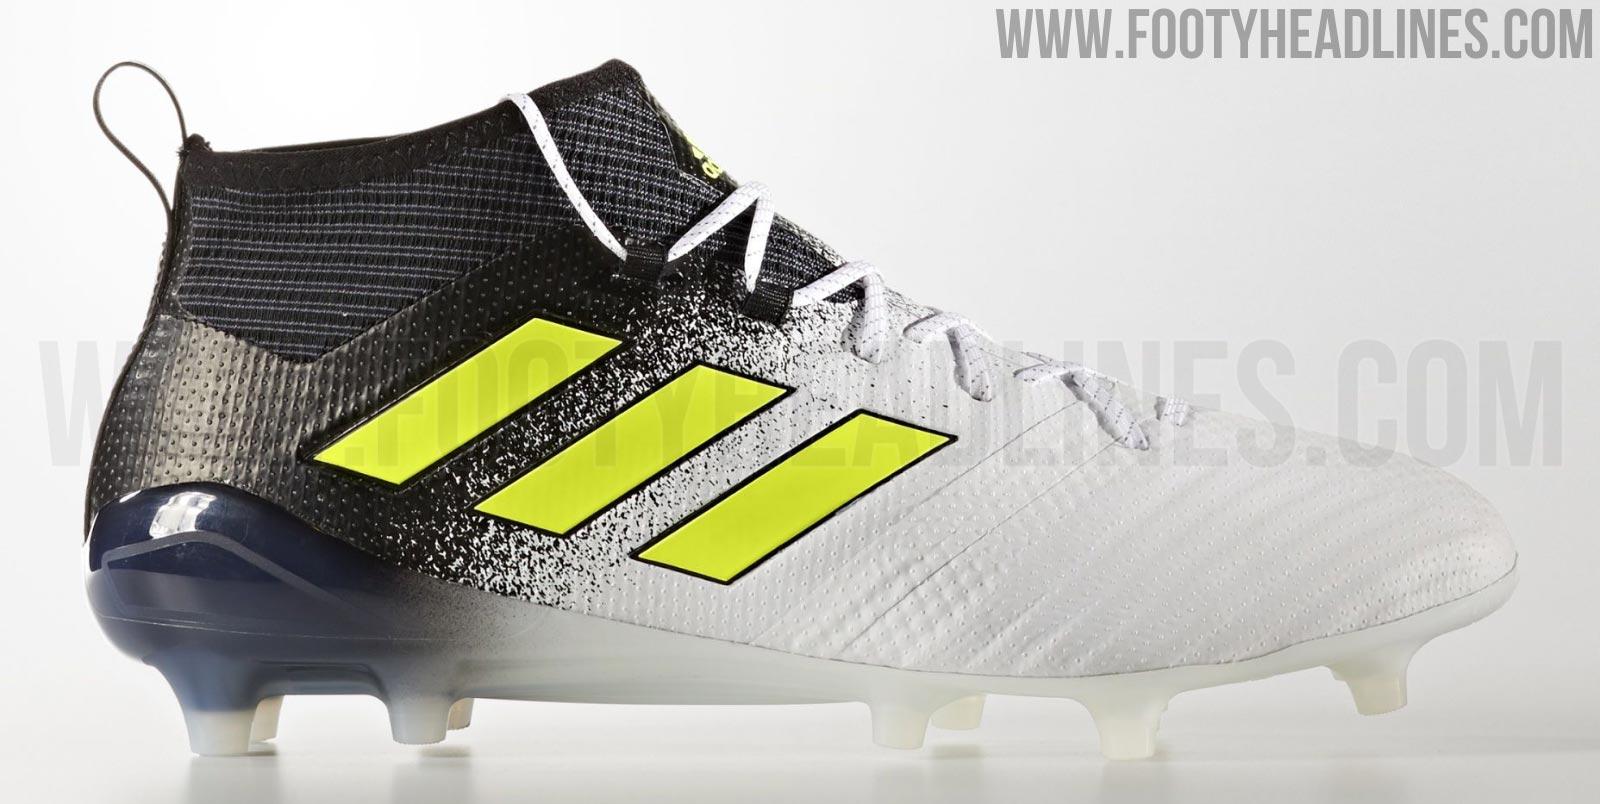 adidas 17.1 black and white